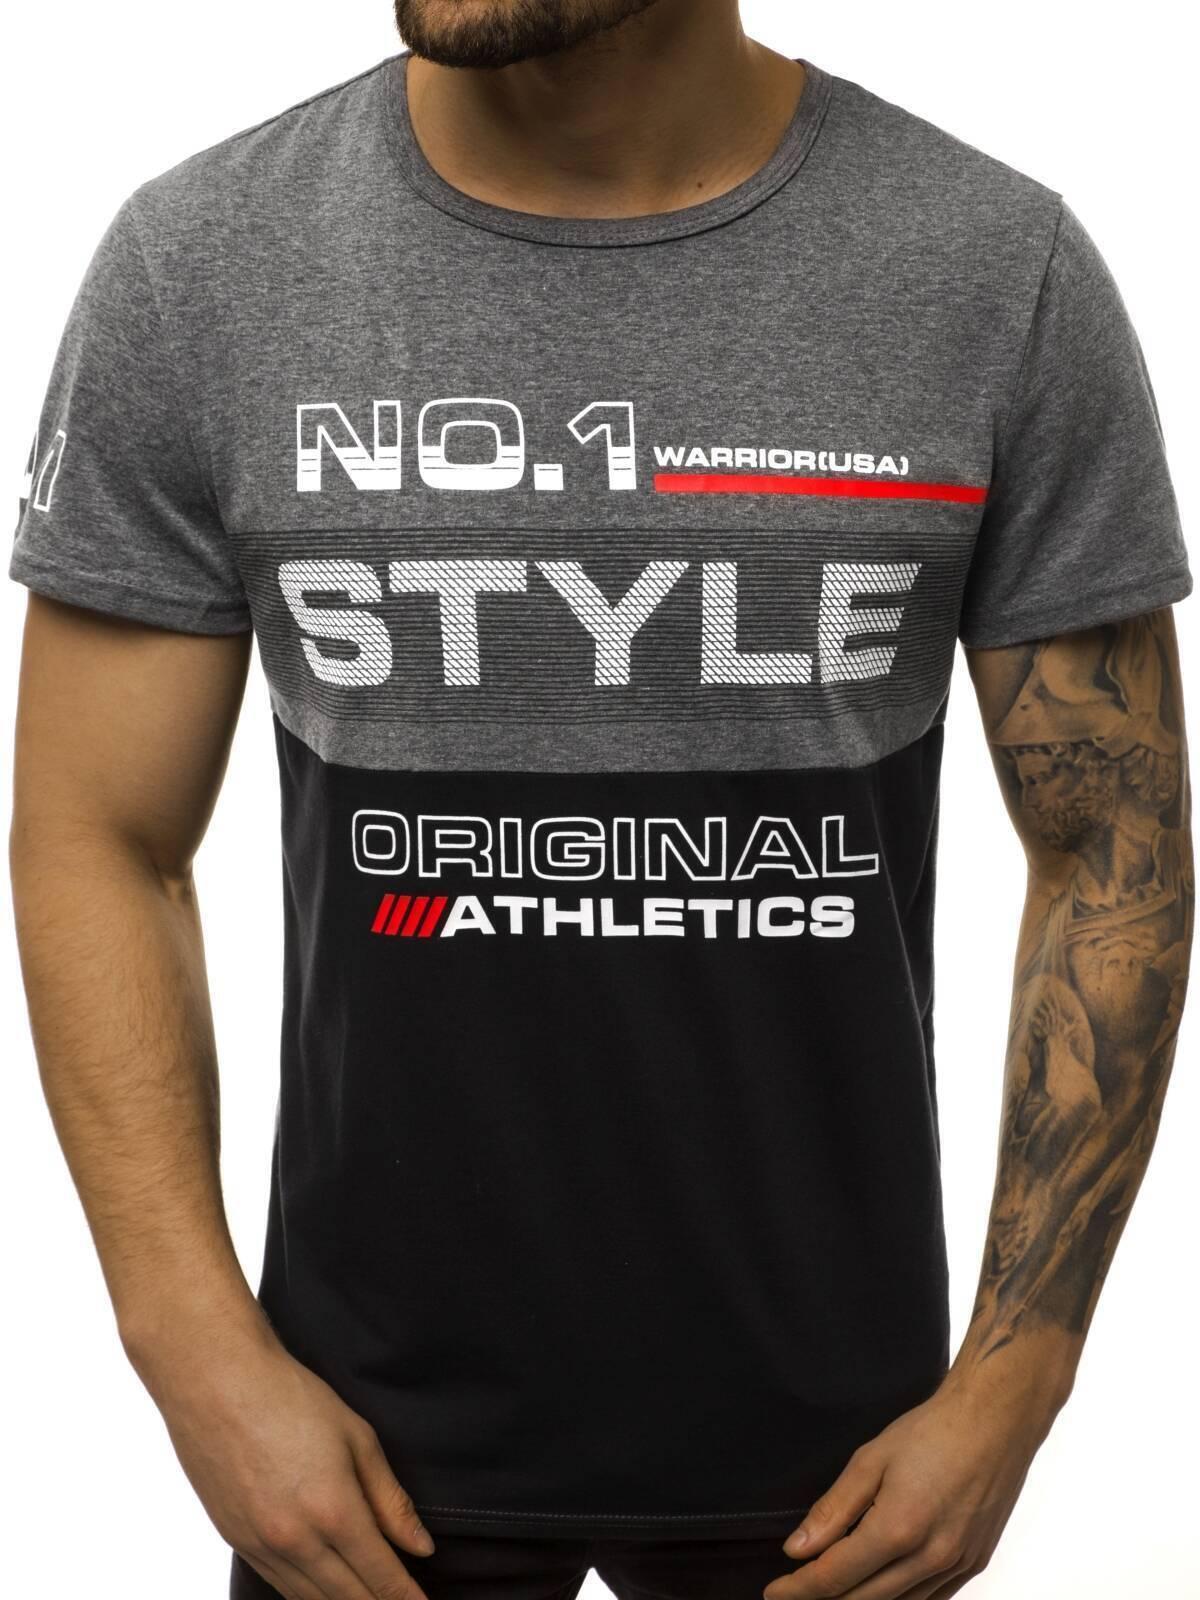 Indexbild 47 - T-Shirt Kurzarm Print Aufdruck Fitness Jogging Sport Shirt Herren OZONEE 12511